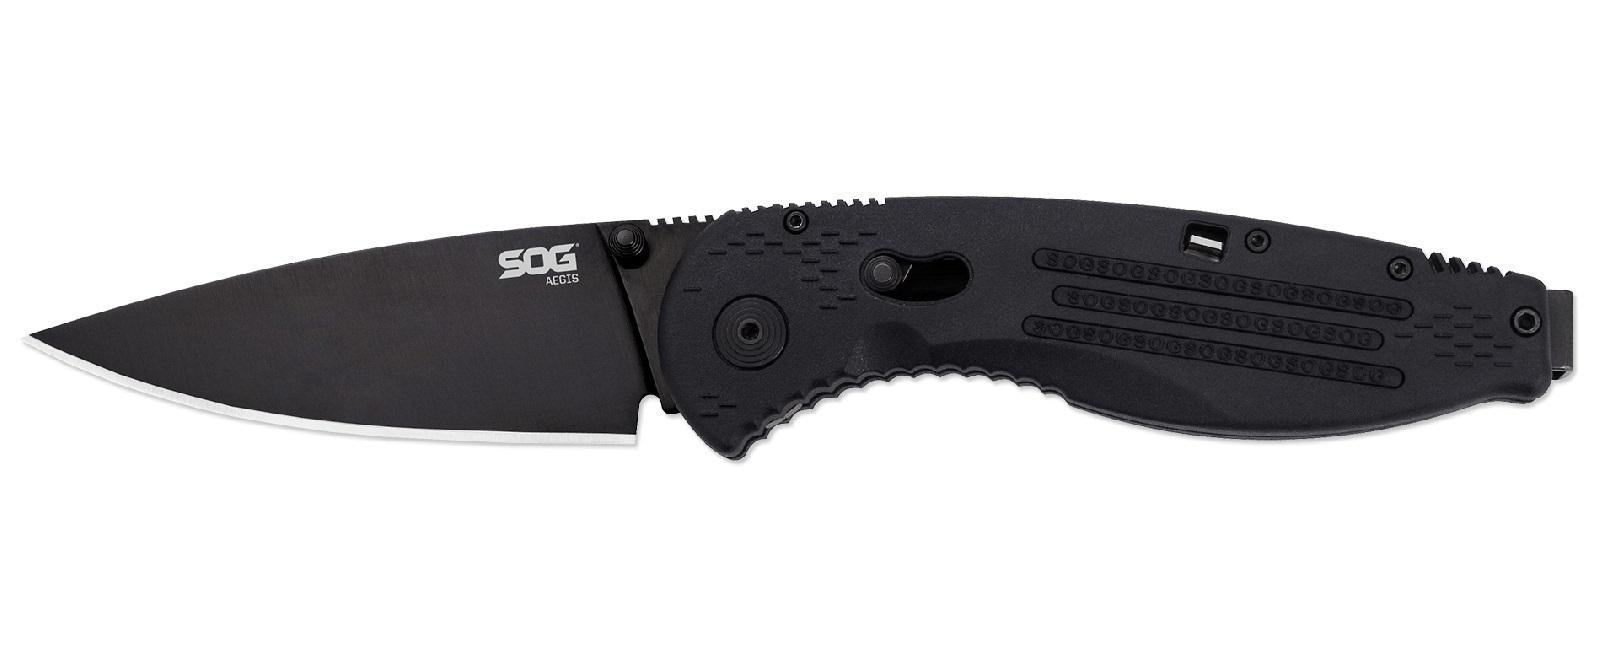 Складной нож с фиксатором Aegis Black 8.9 см. - SOG AE02, сталь AUS-8, рукоять пластик GRN